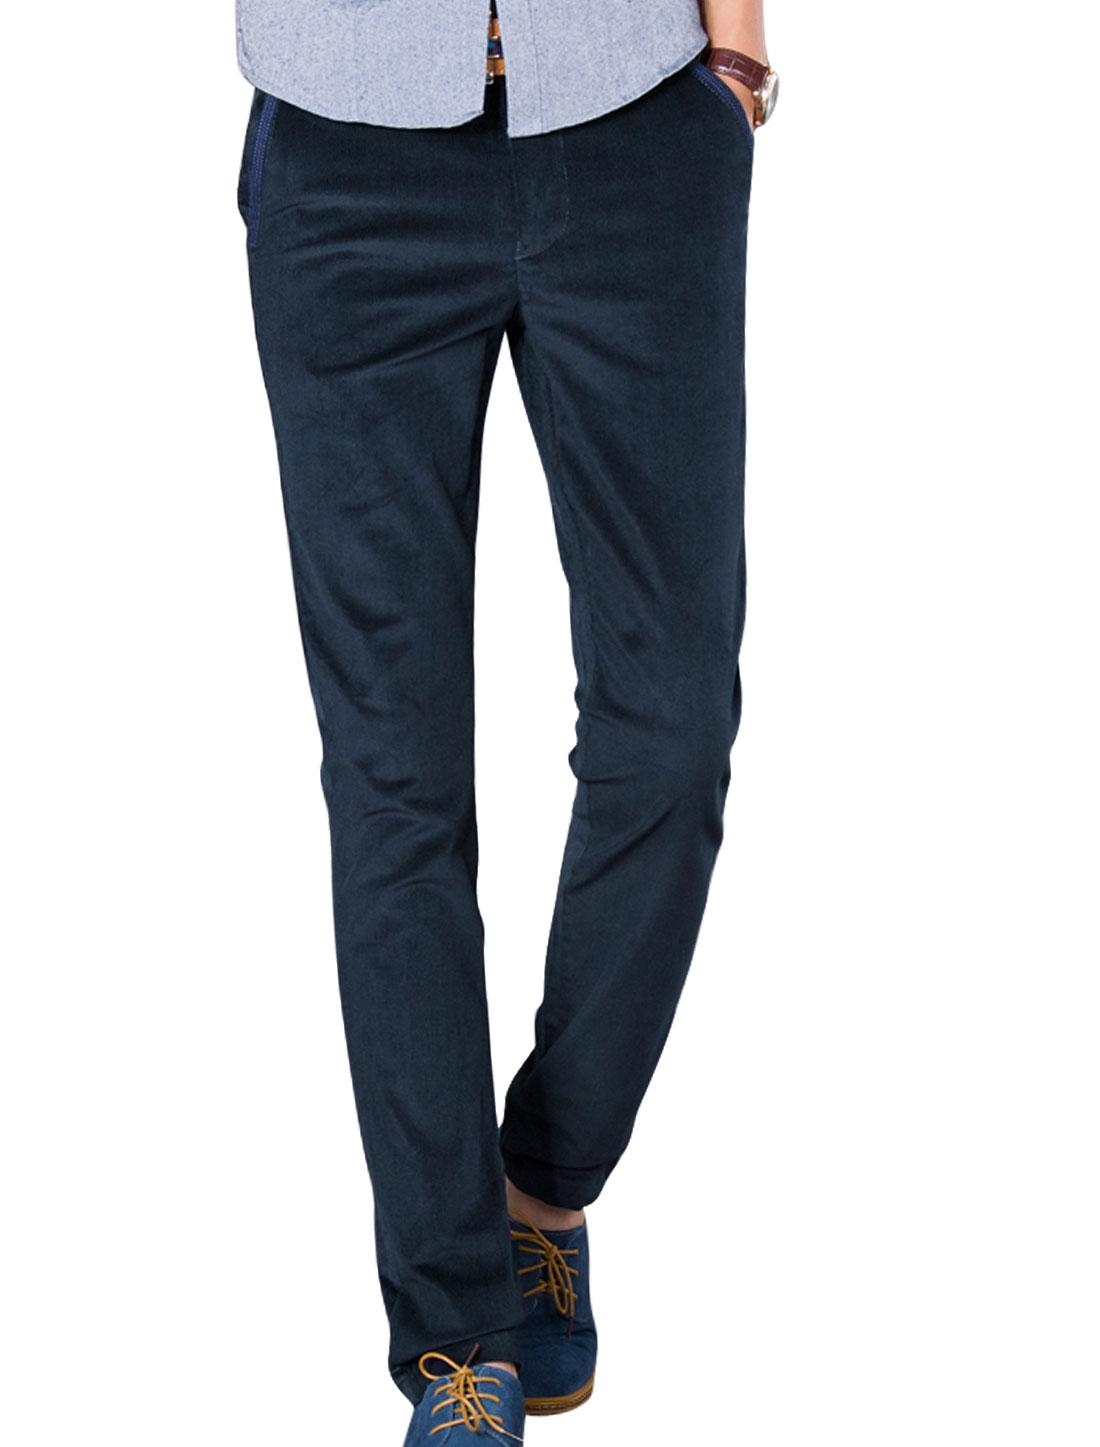 Men Navy Blue Zip Down Mid Rise Belt Loop Front Pockets Casaul Pants W 32